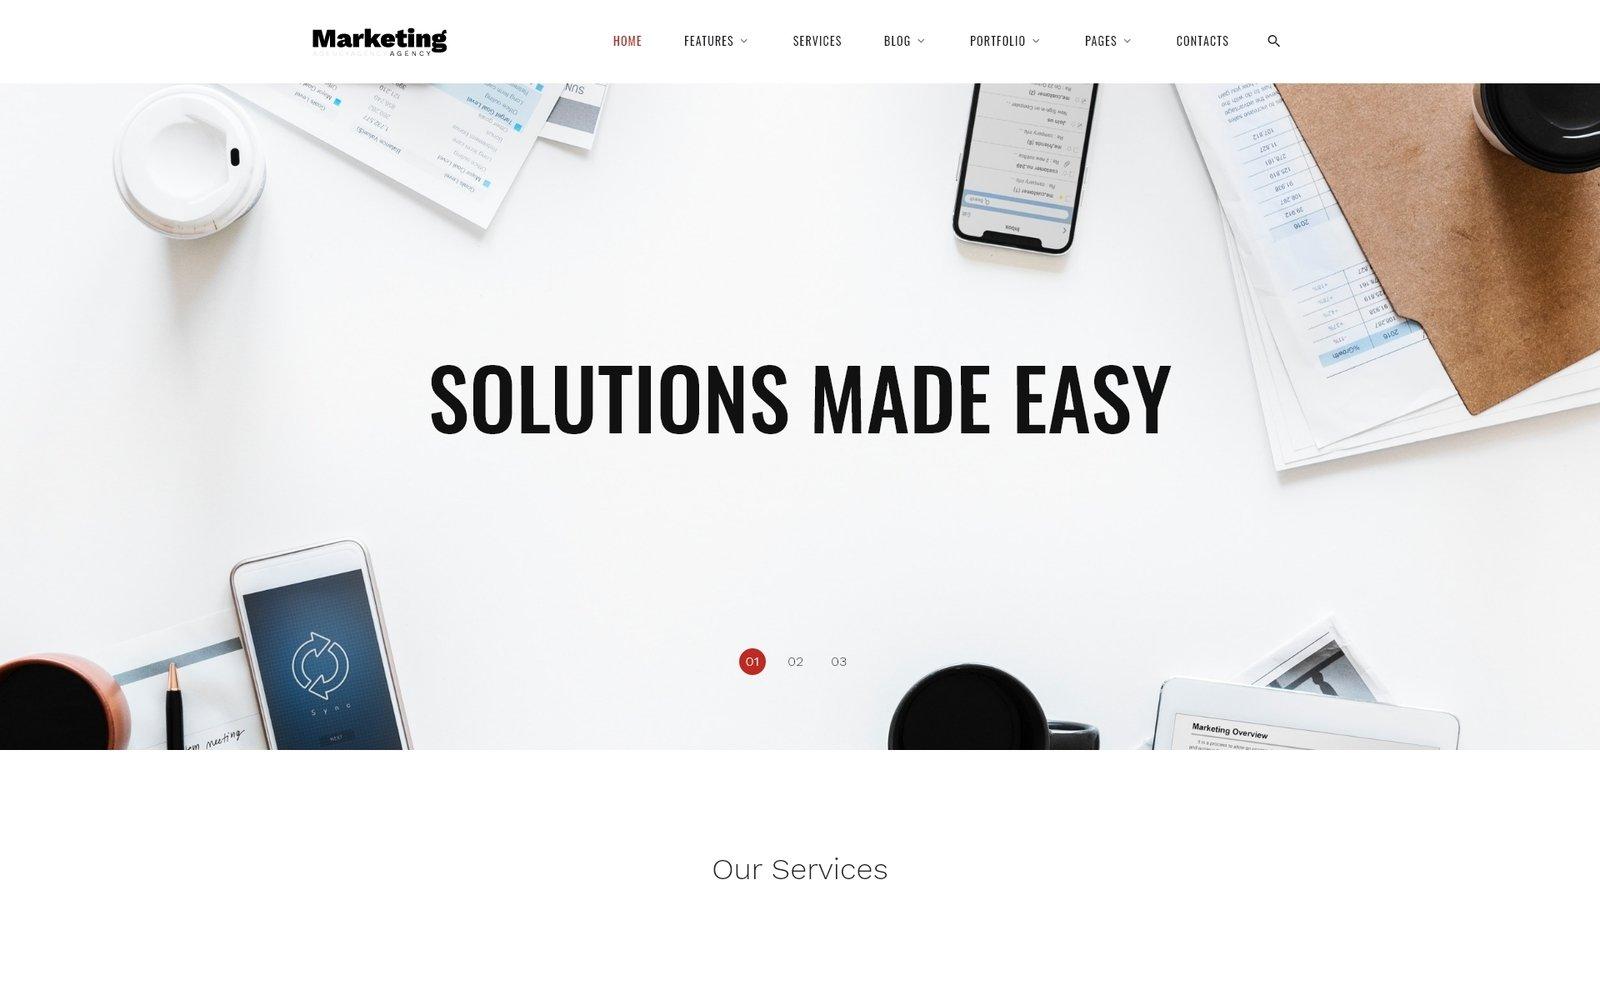 """Marketing Agency - Responsive Marketing Agency Multipage"" - адаптивний Шаблон сайту №69397"